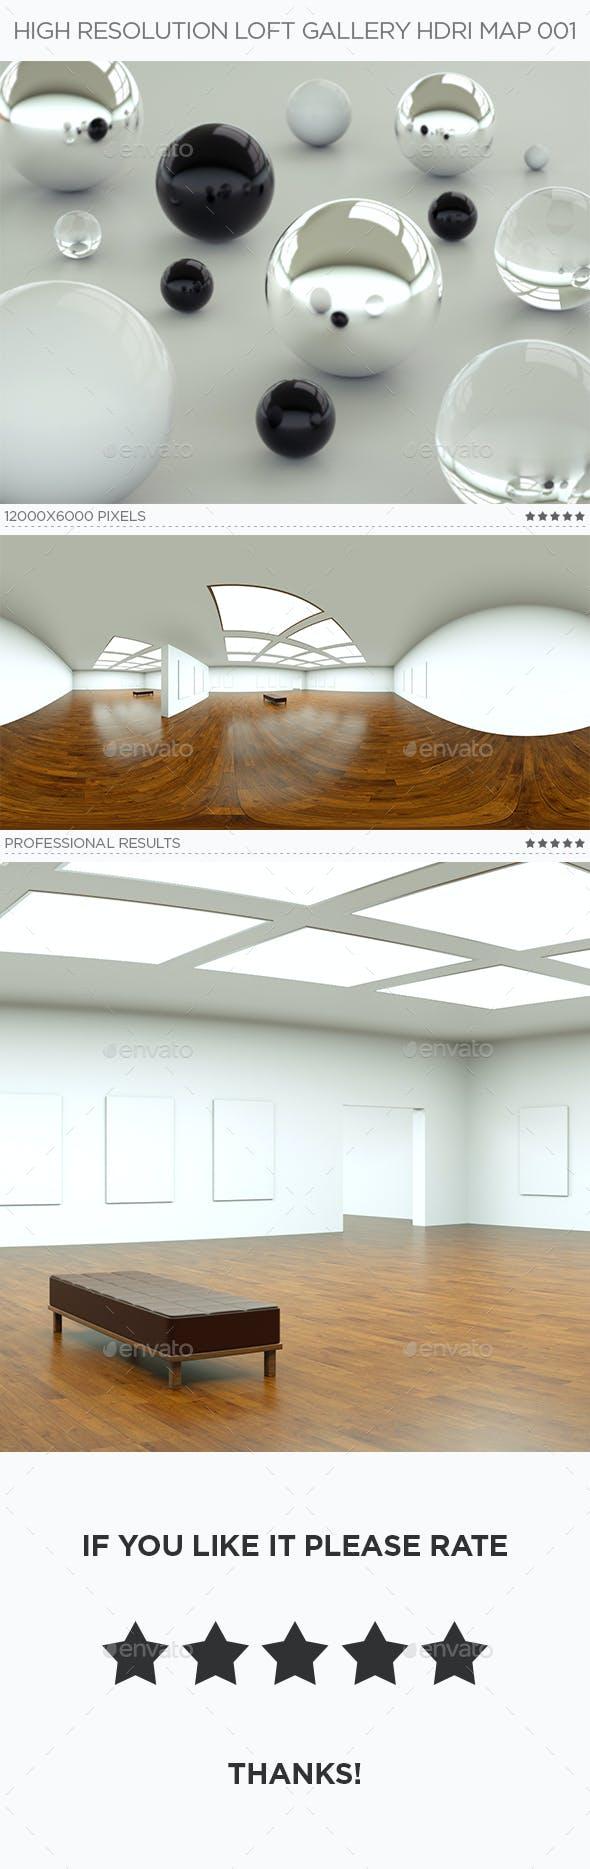 High Resolution Loft Gallery HDRi Map 001 - 3DOcean Item for Sale